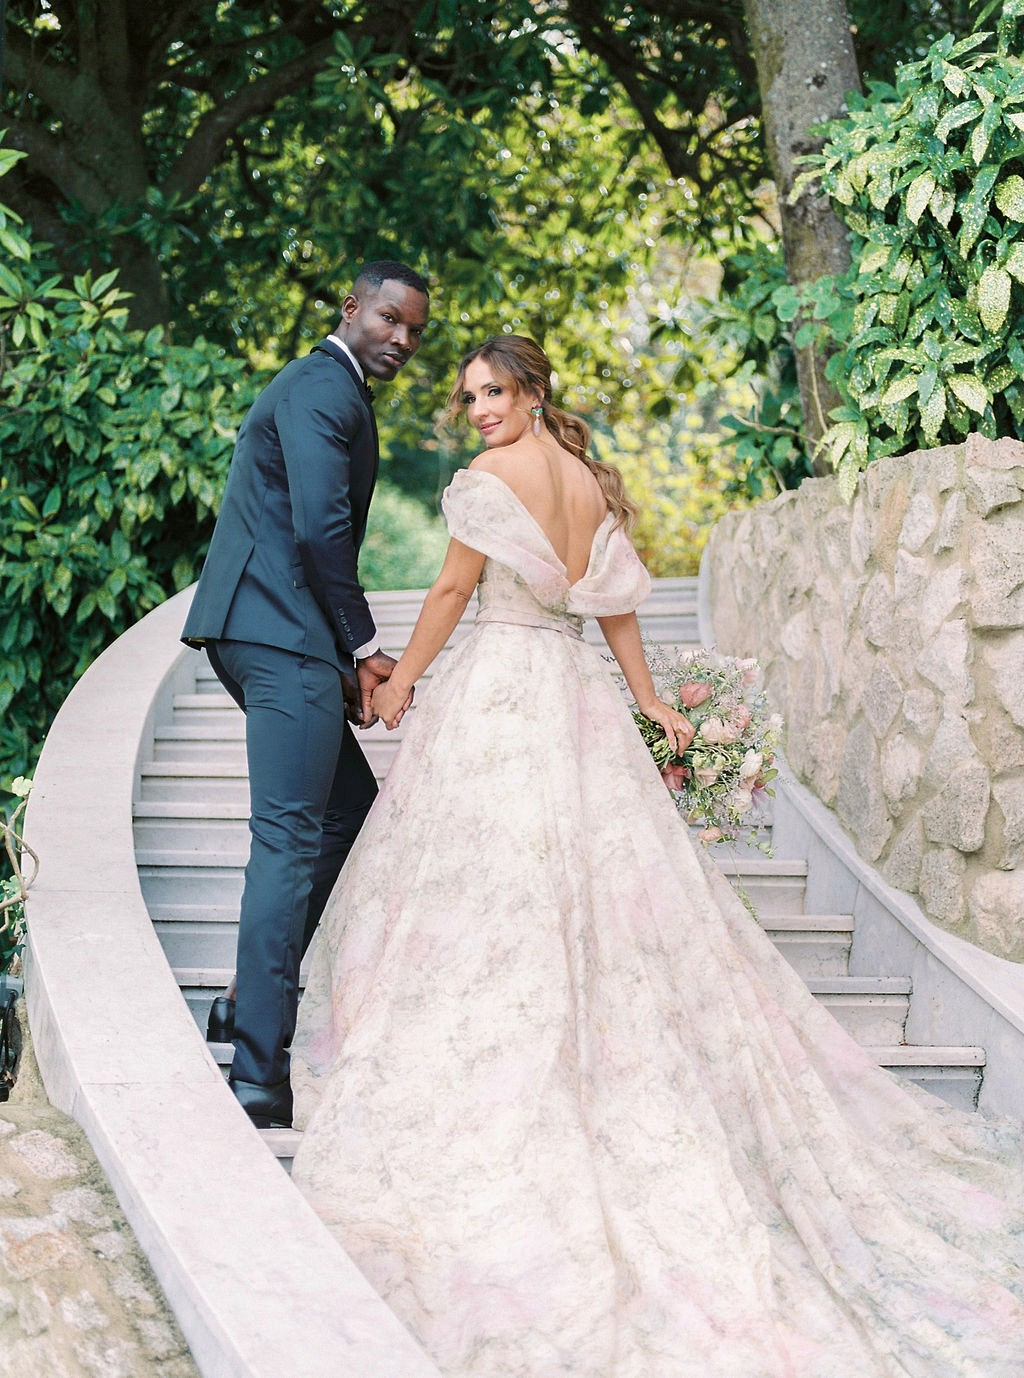 Floral Wedding dress ideas